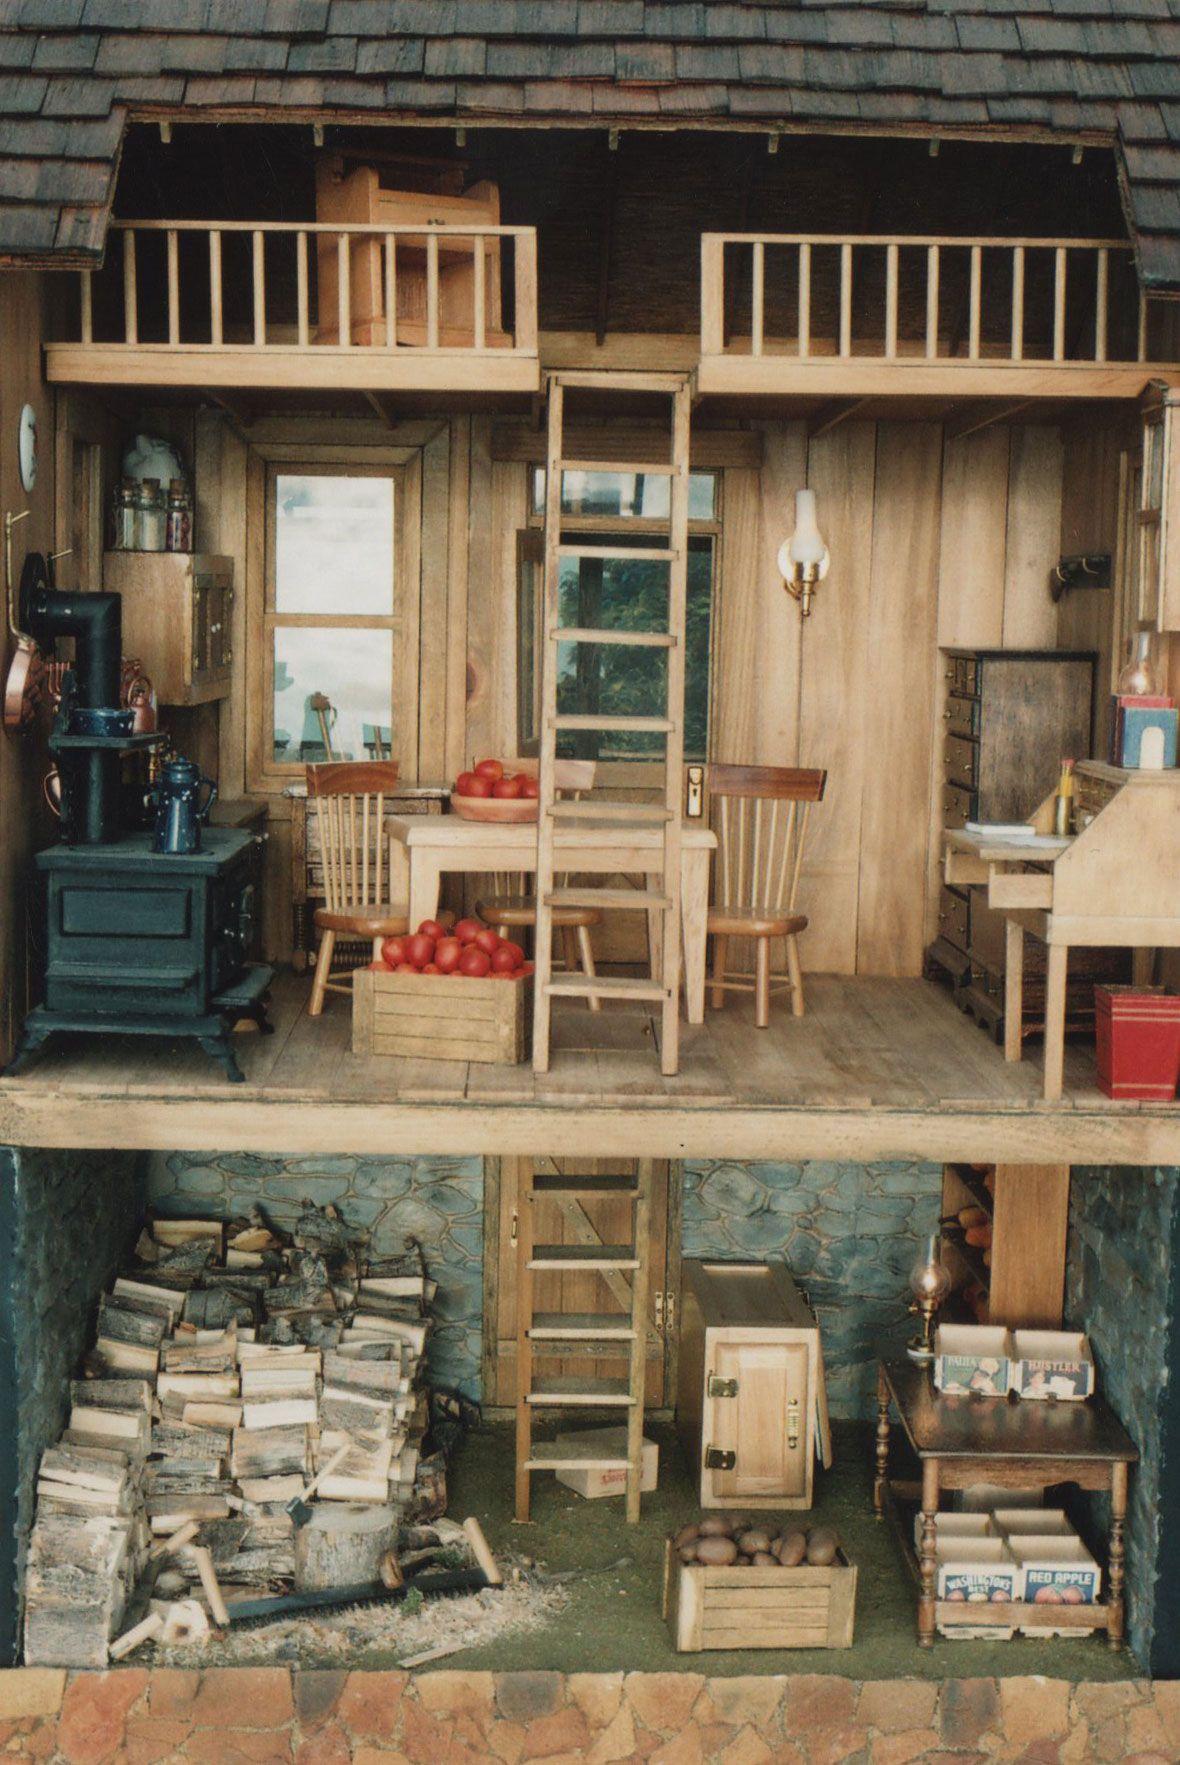 i like the idea of adding a basement under the dollhouse..